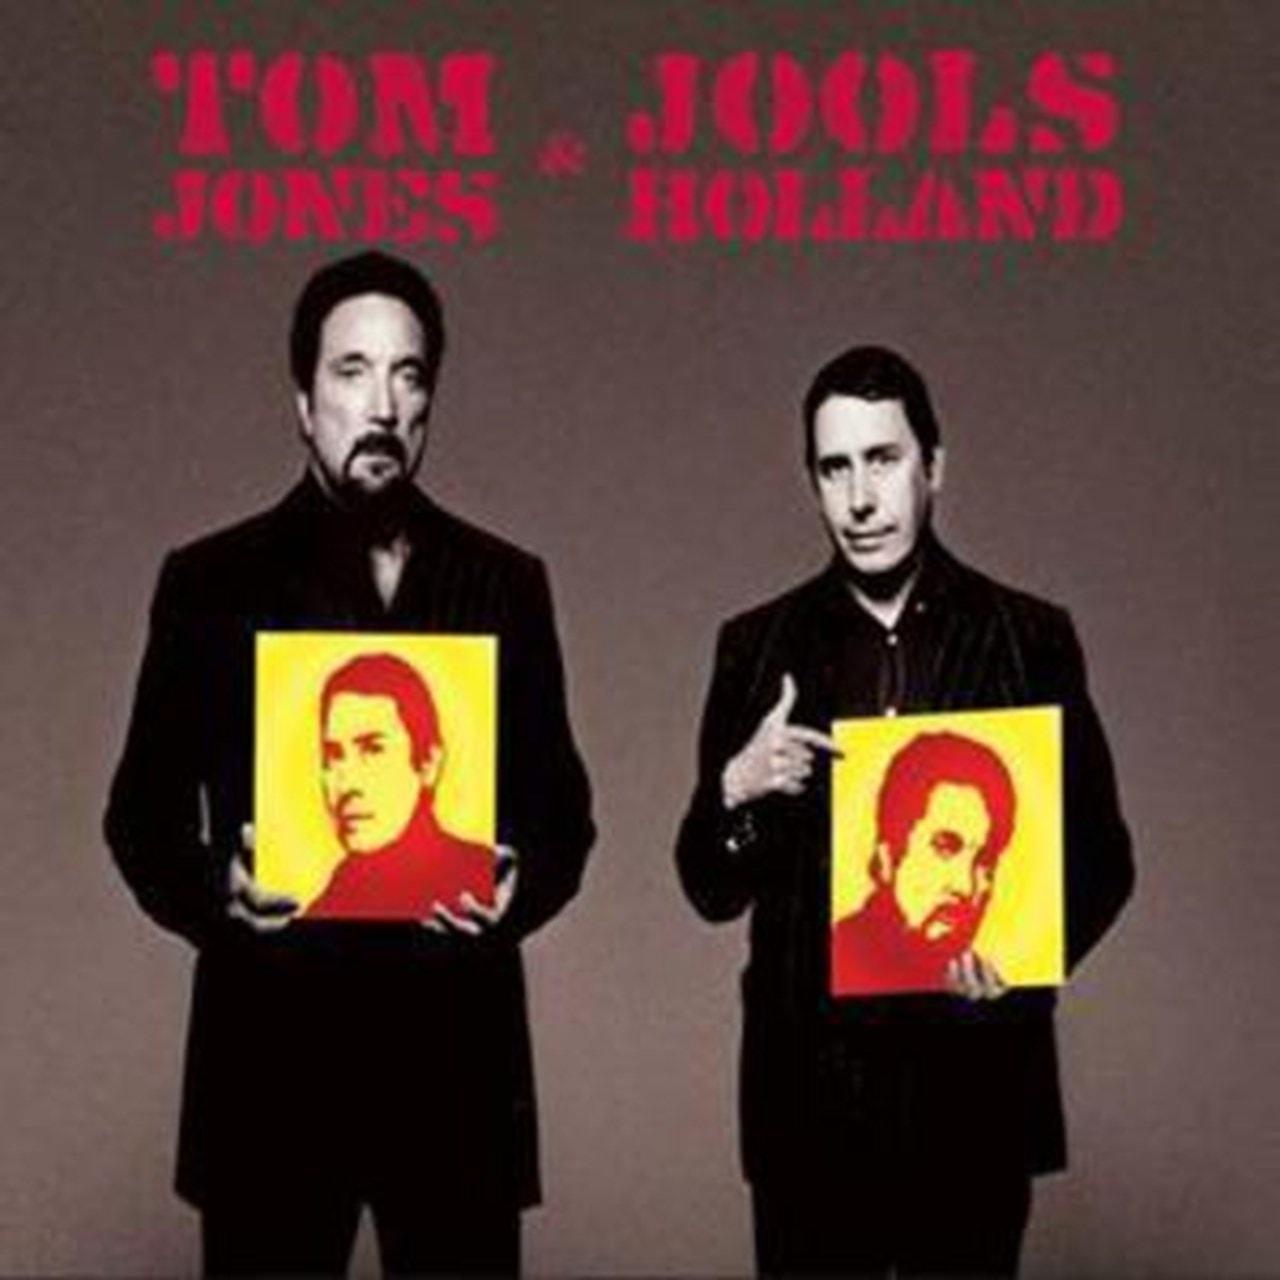 Tom Jones and Jools Holland - 1